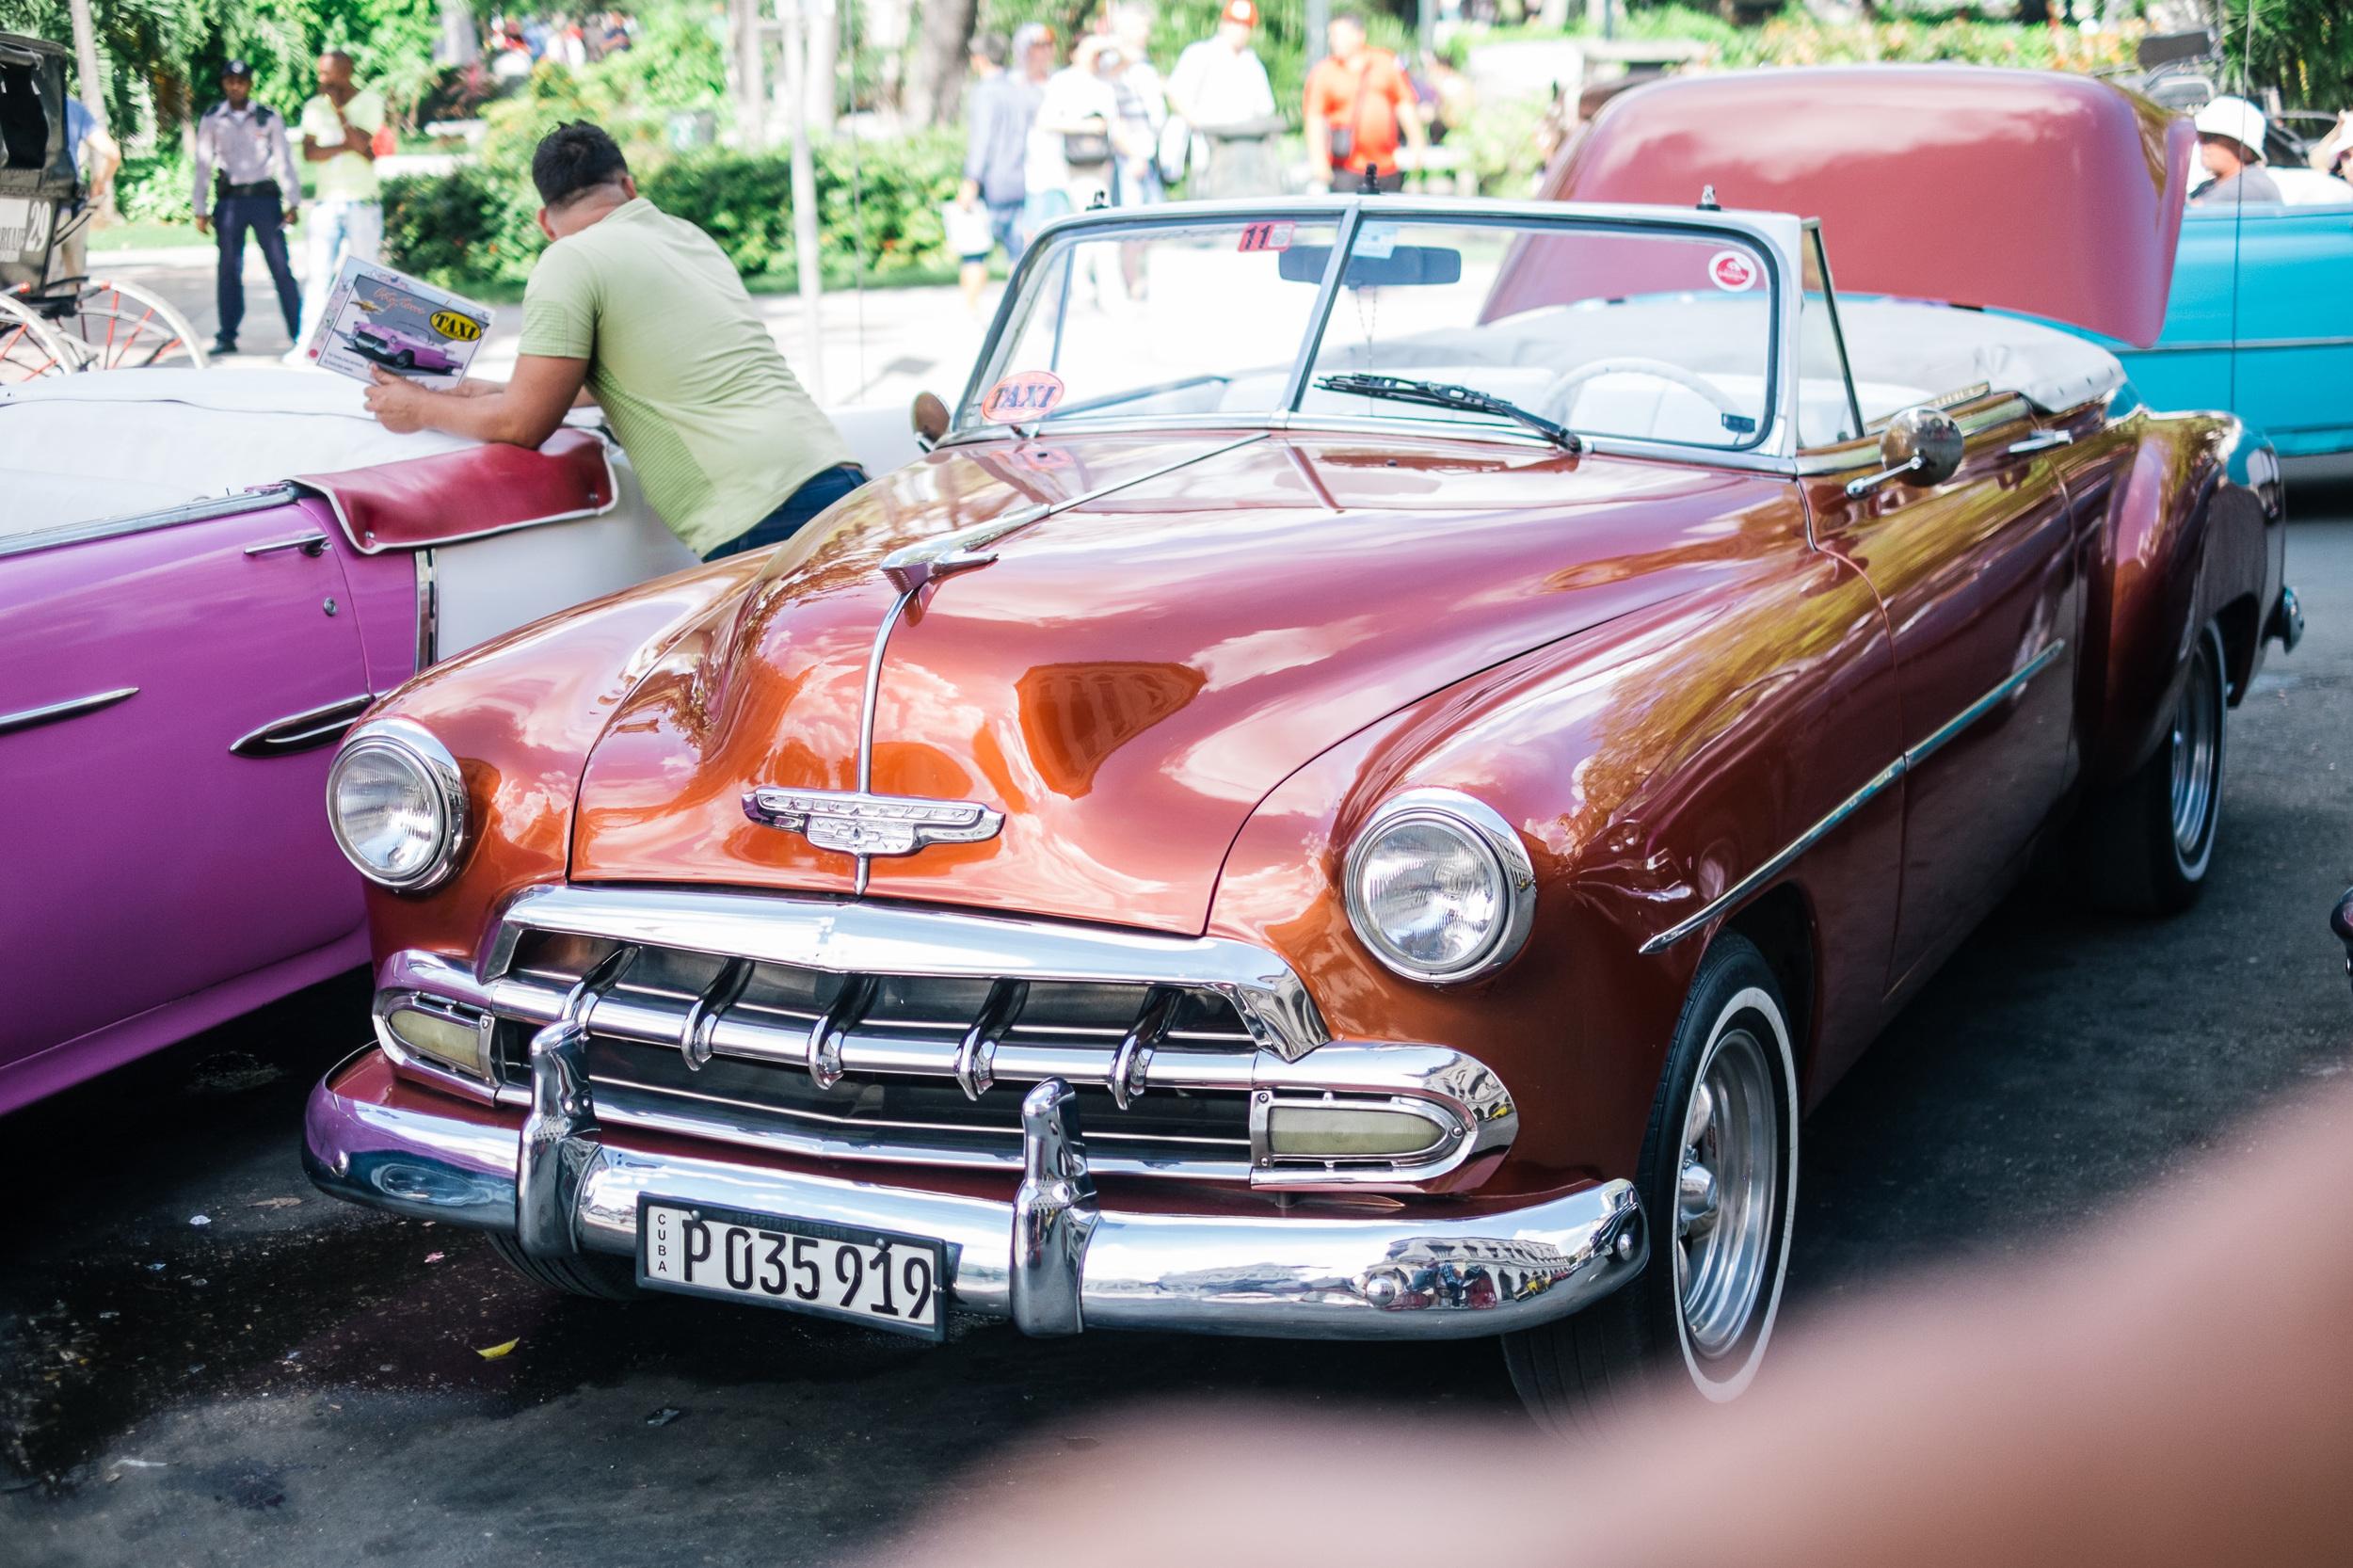 DeClaro-Photography-Cuba-0230.jpg